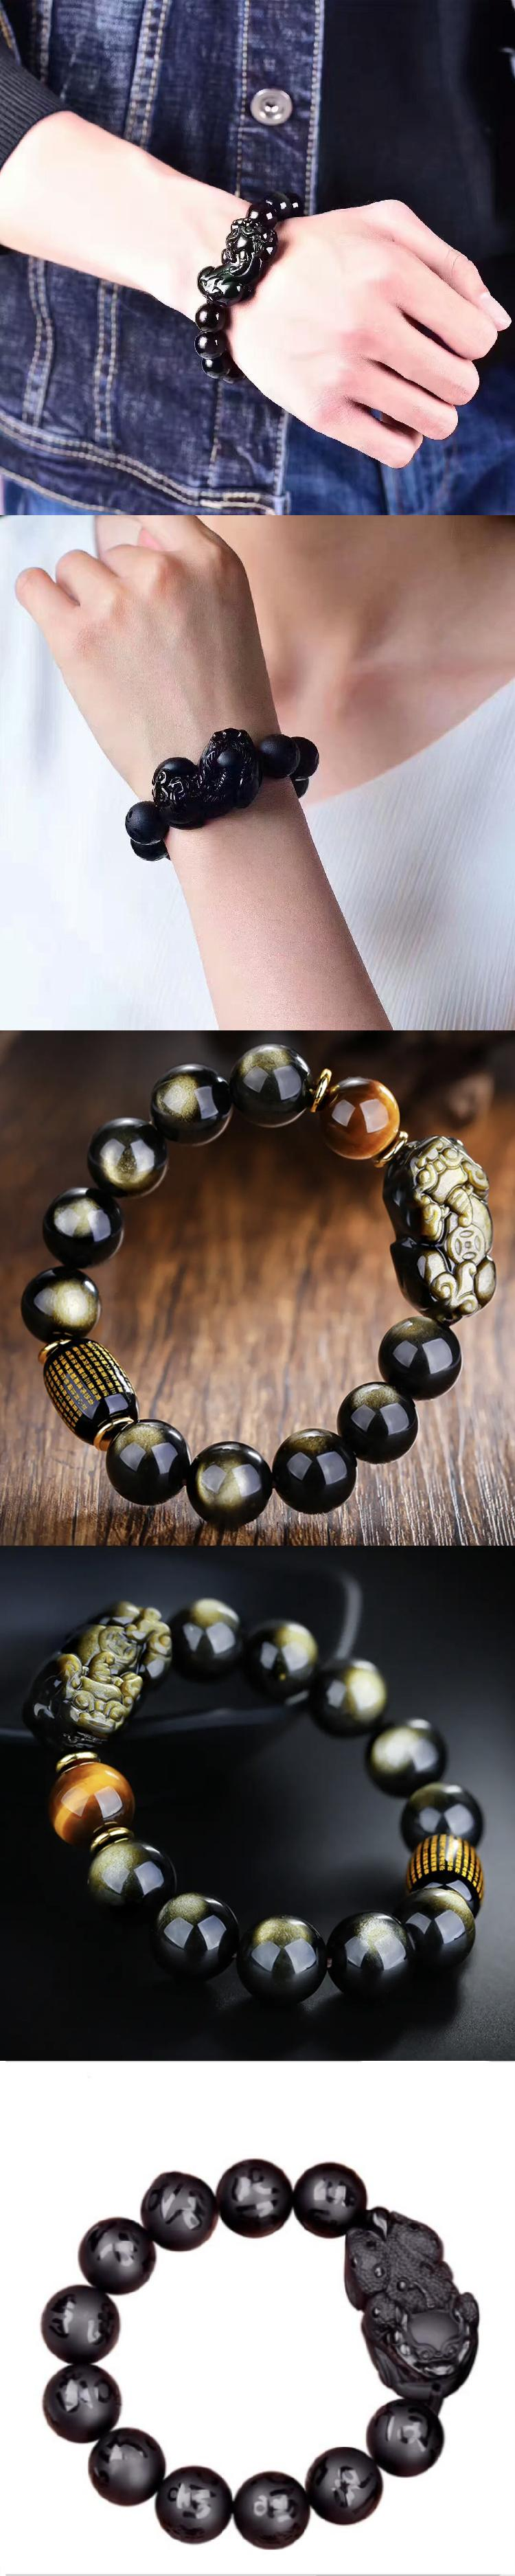 Valentine's day gifts obsidian pixiu charms for bracelet making jewelry bracelets women